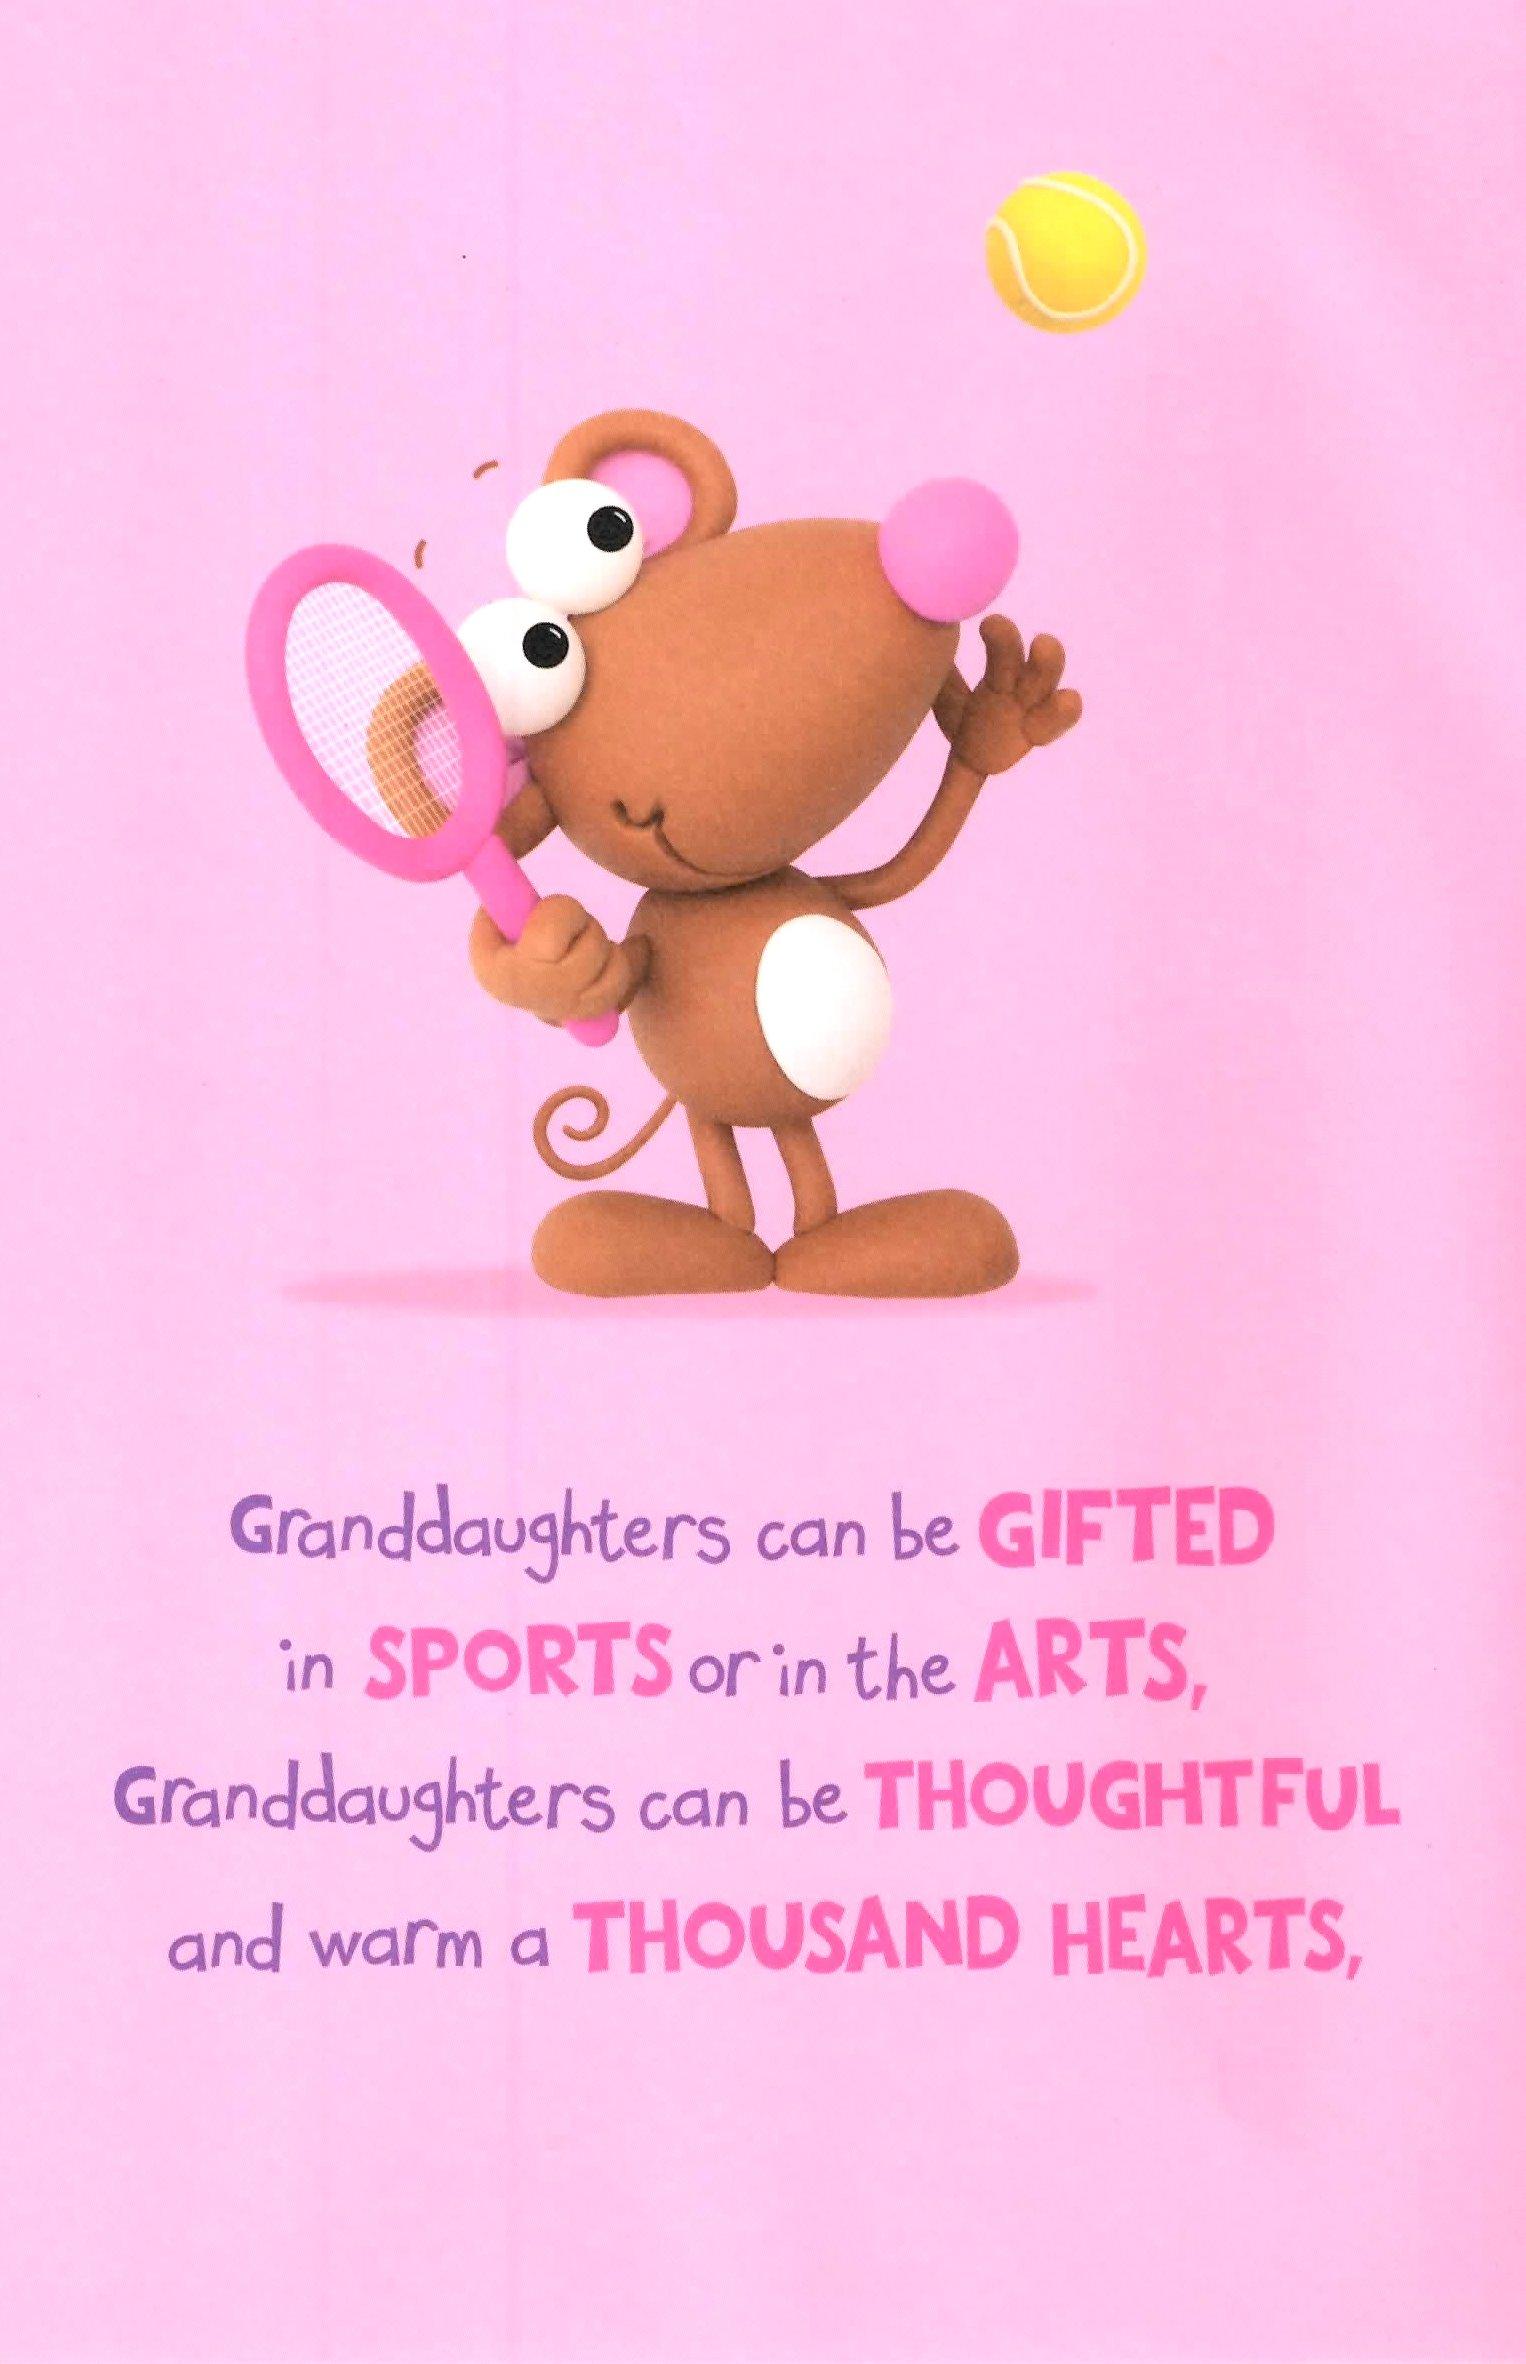 Sentinel Cute Wonderful Granddaughter Birthday Greeting Card Crackers Range Cards New